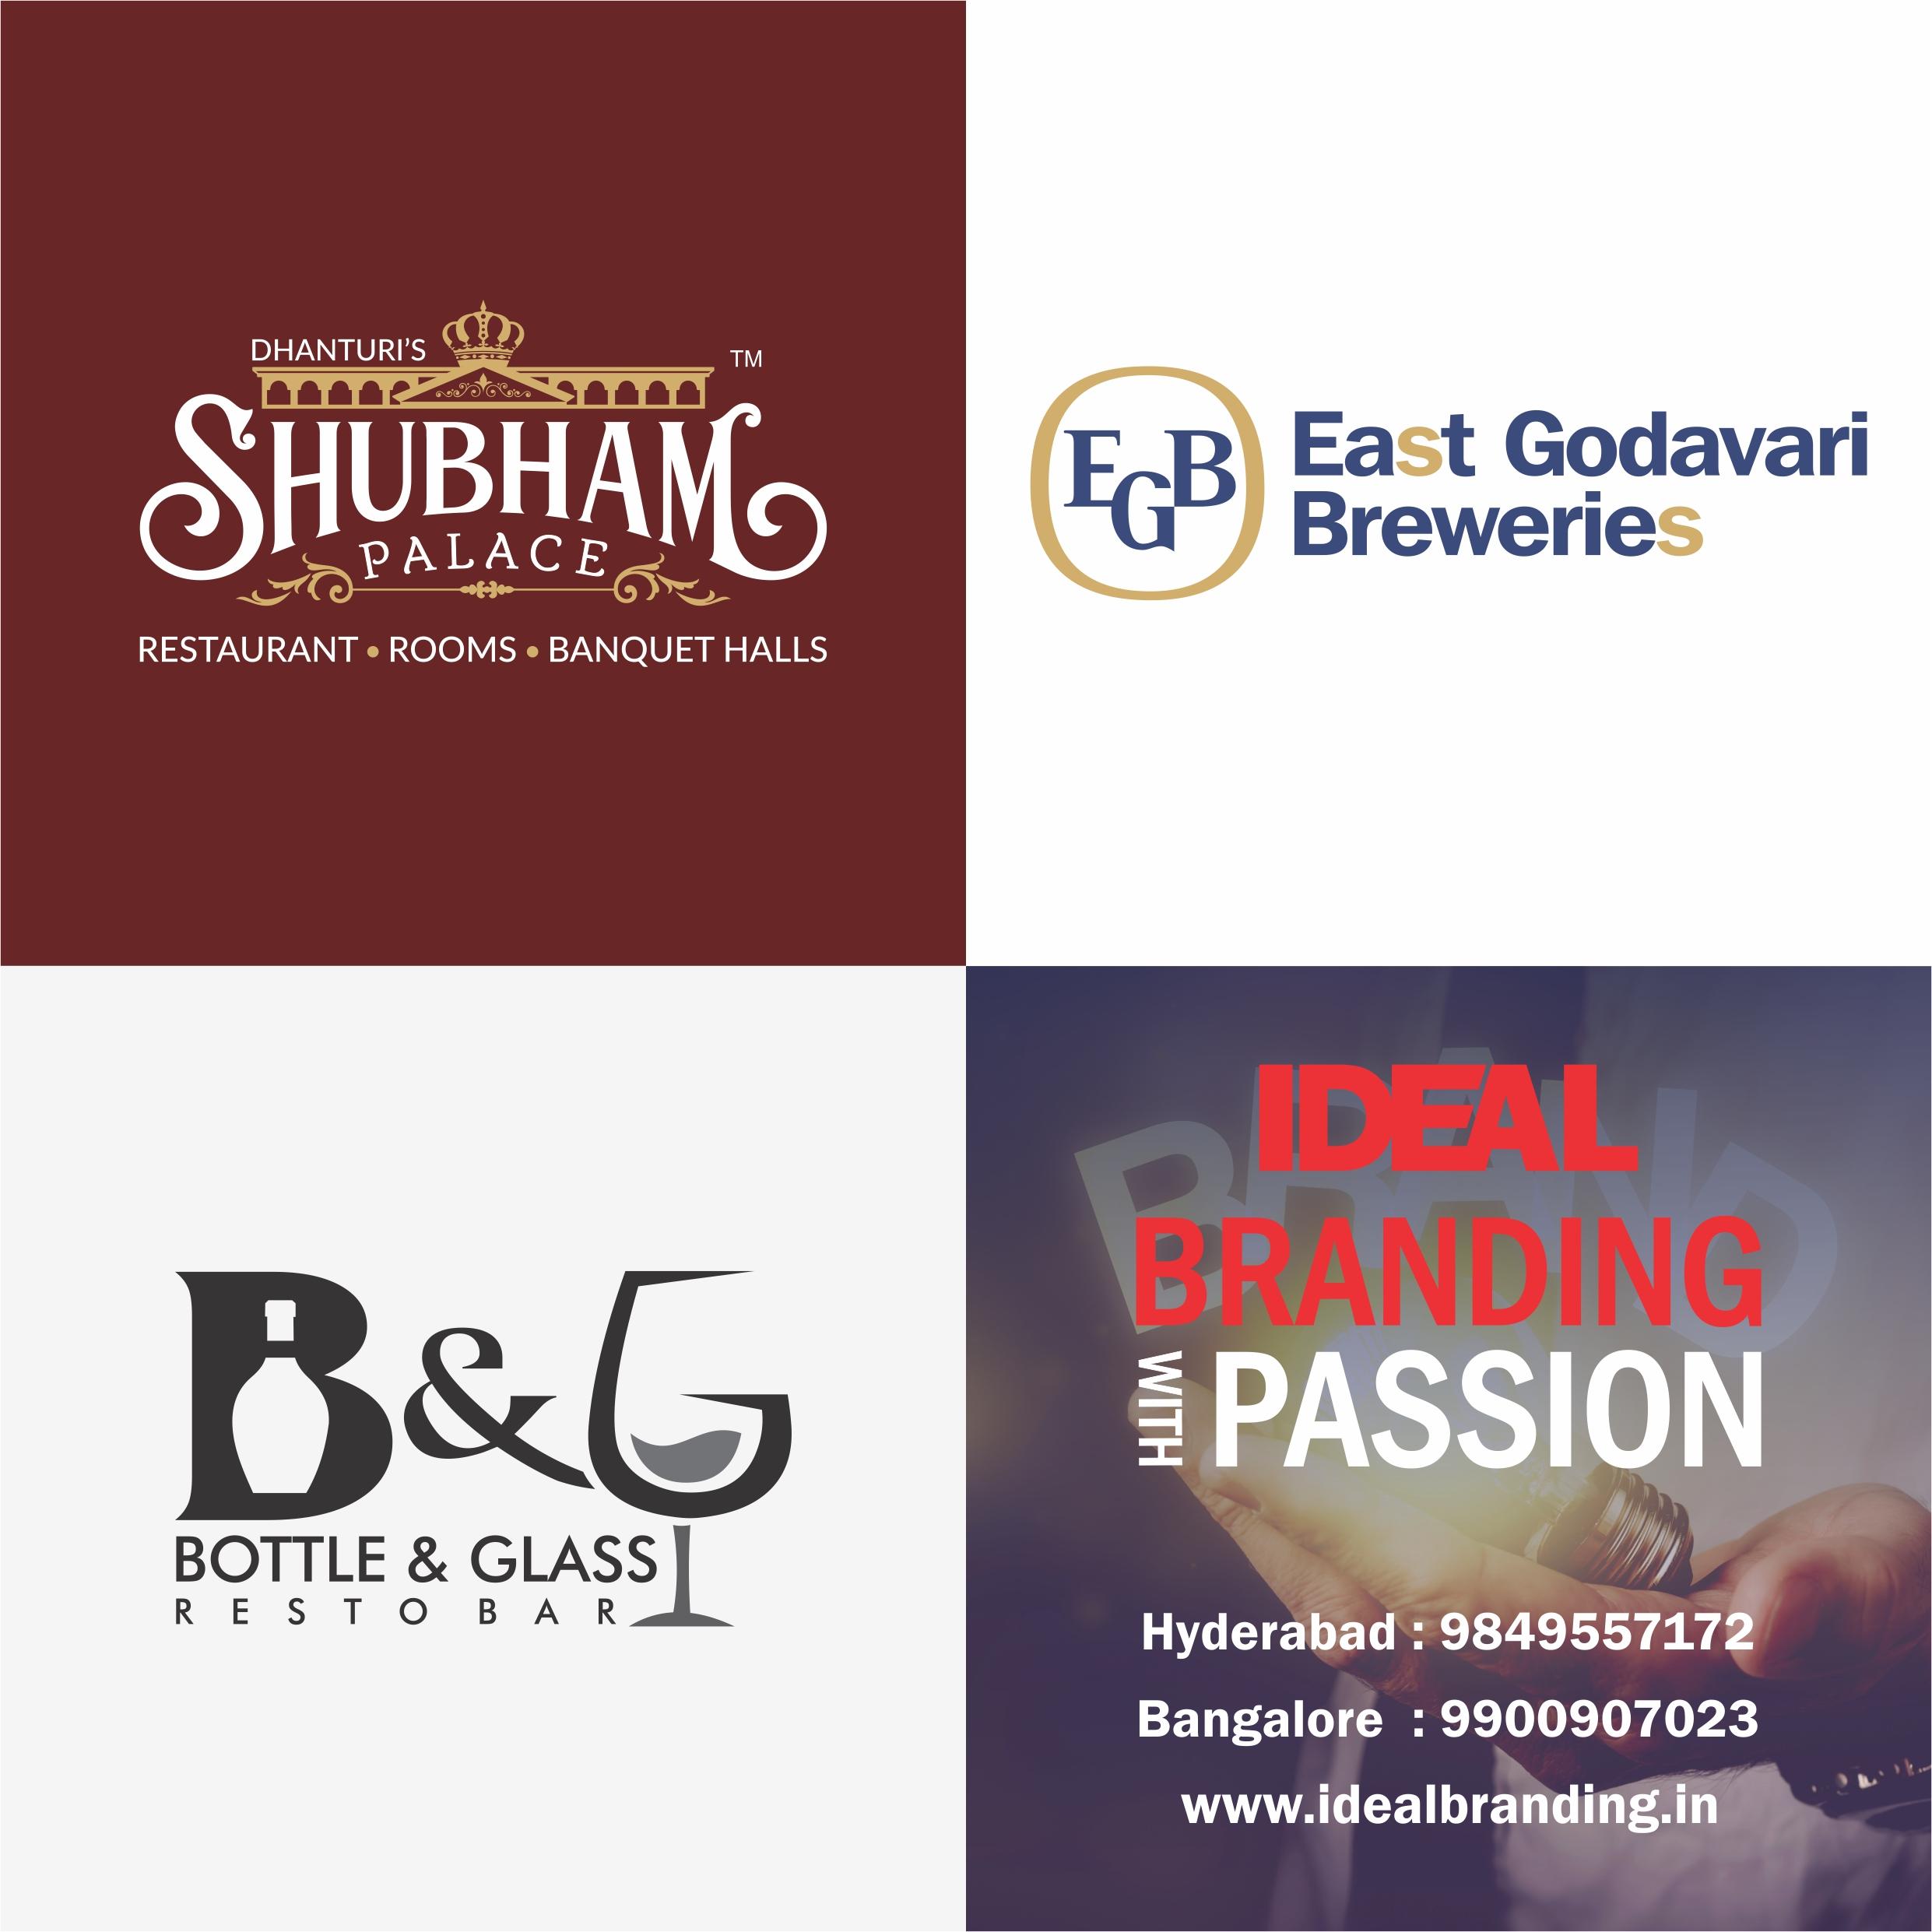 hotel branding, restaurant branding, #real estate branding agency hyderabad, # ad agencies in hyderabad, branding #agency in hyderabad, direct marketing #agencies in hyderabad, creative ad agency